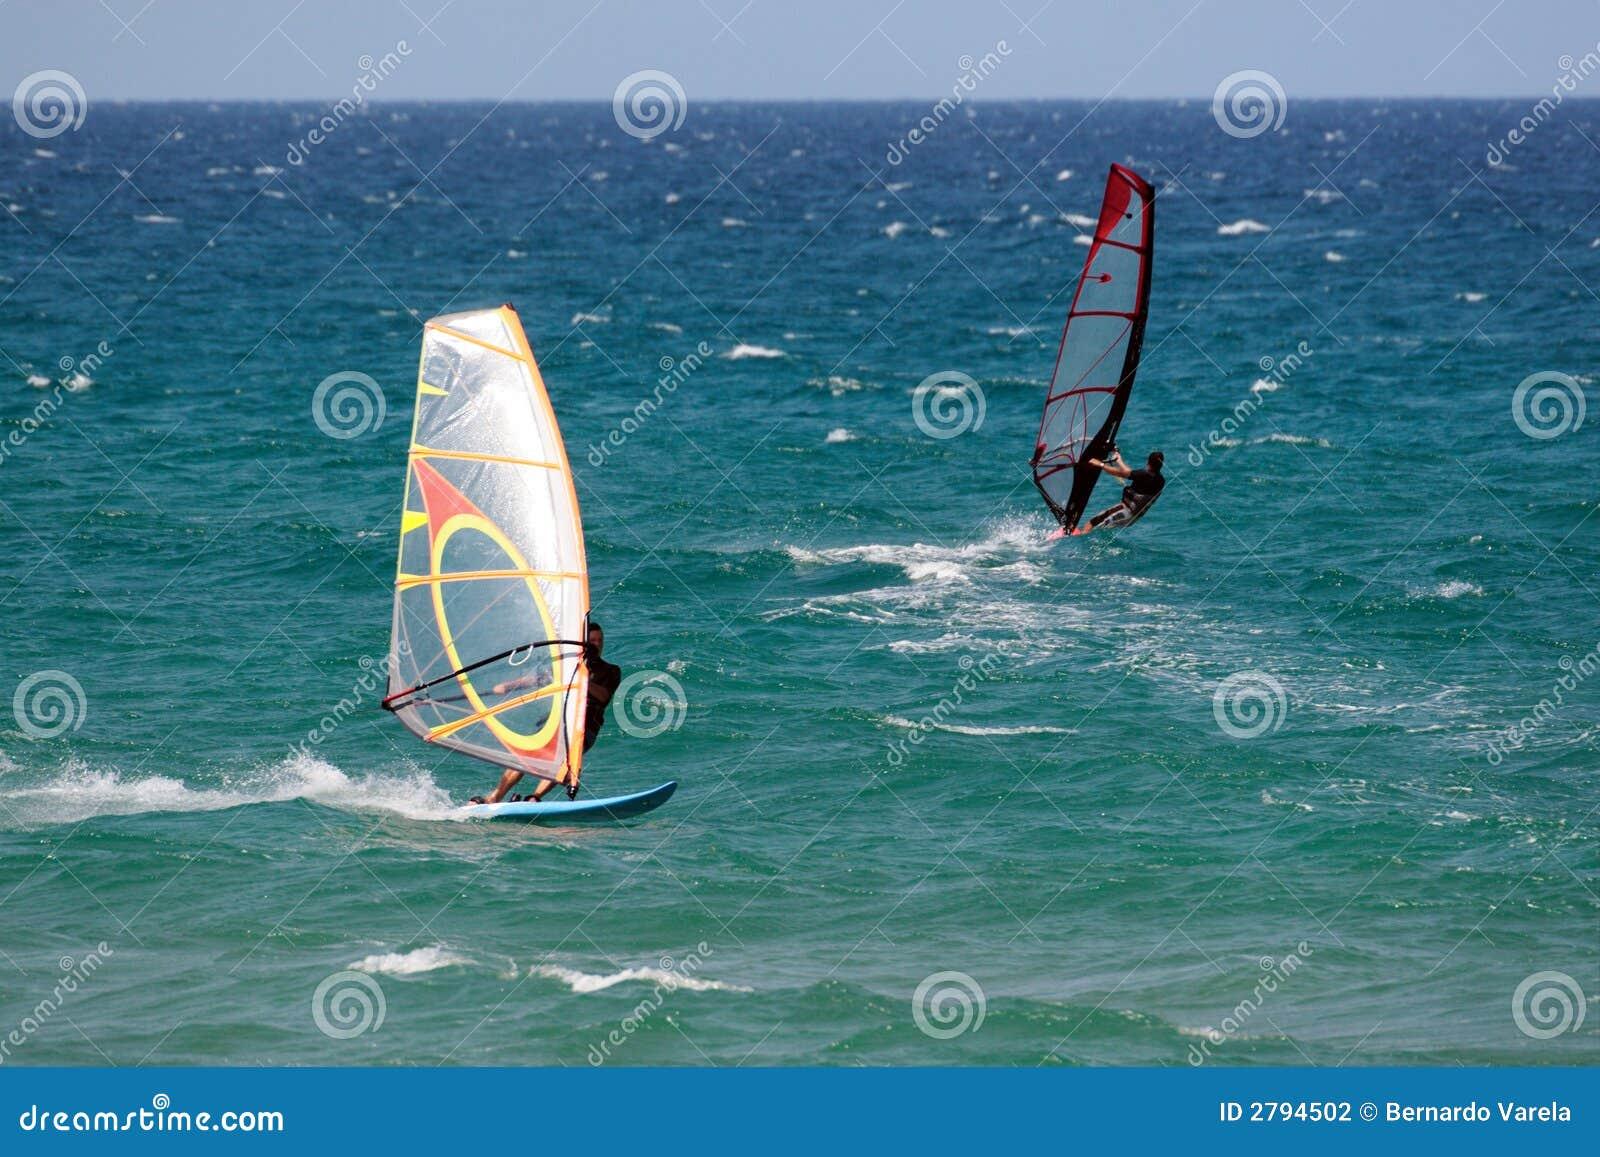 4风帆冲浪